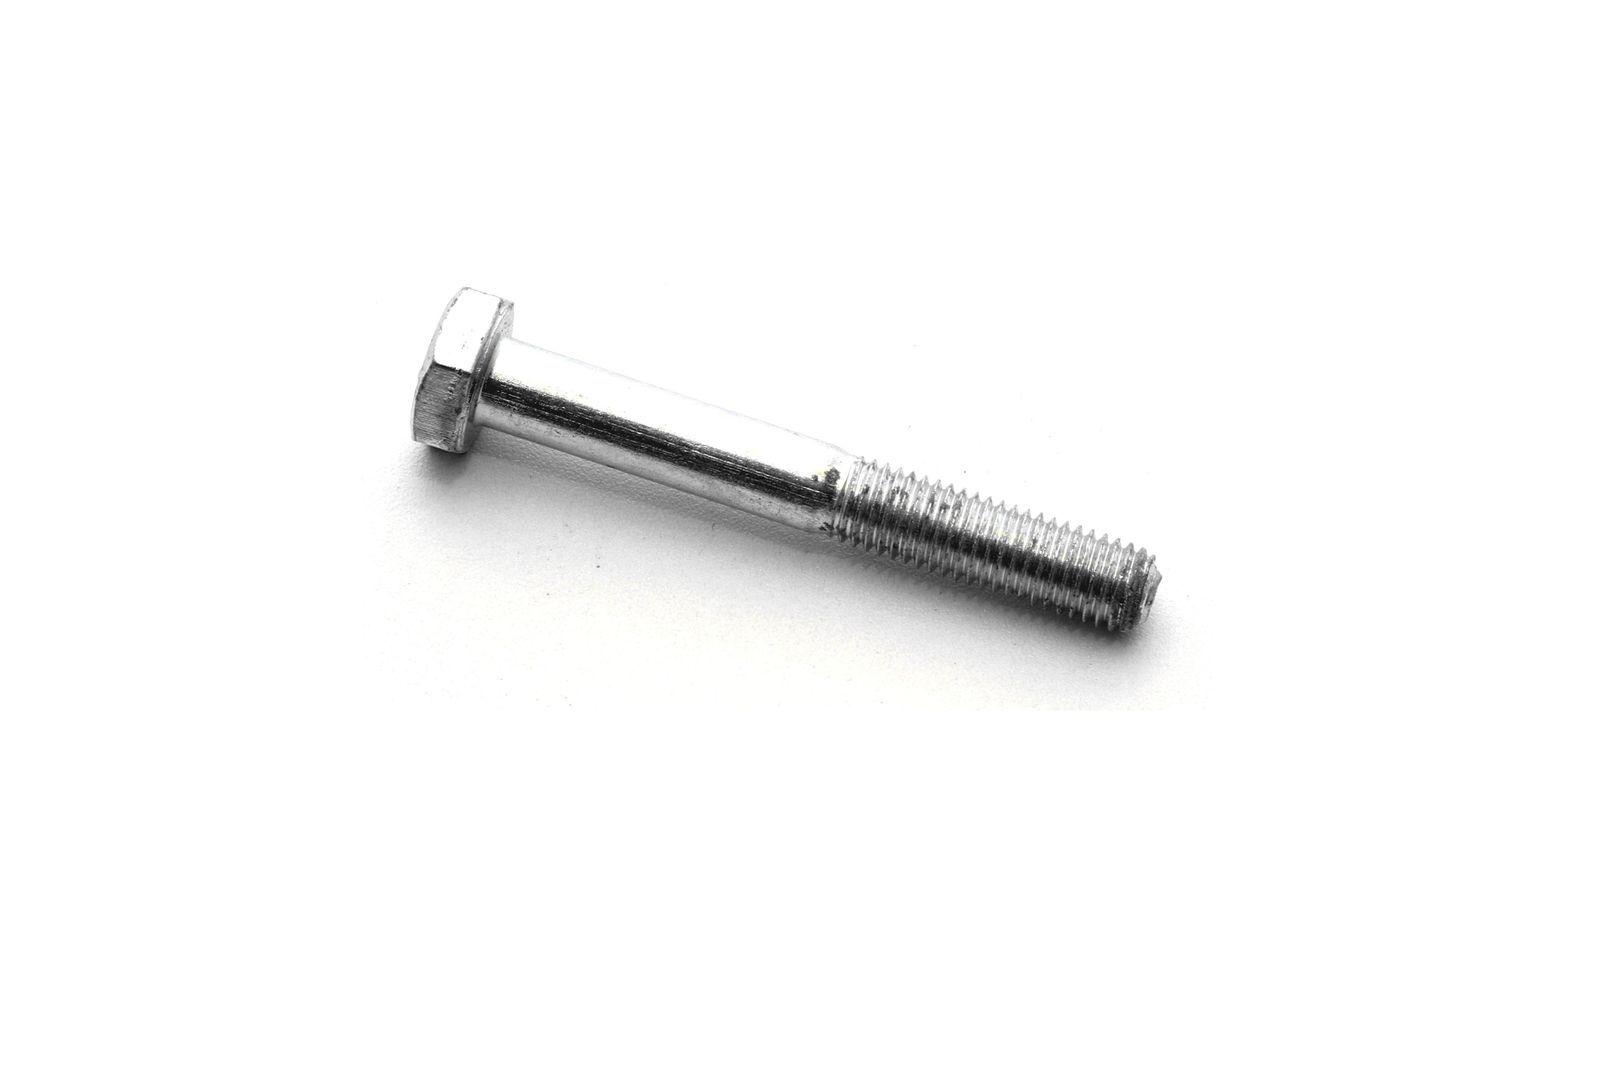 "#1002-07 Bolzen UNF 1/4"" x 1 7/8"" (2x), BH604151|2"